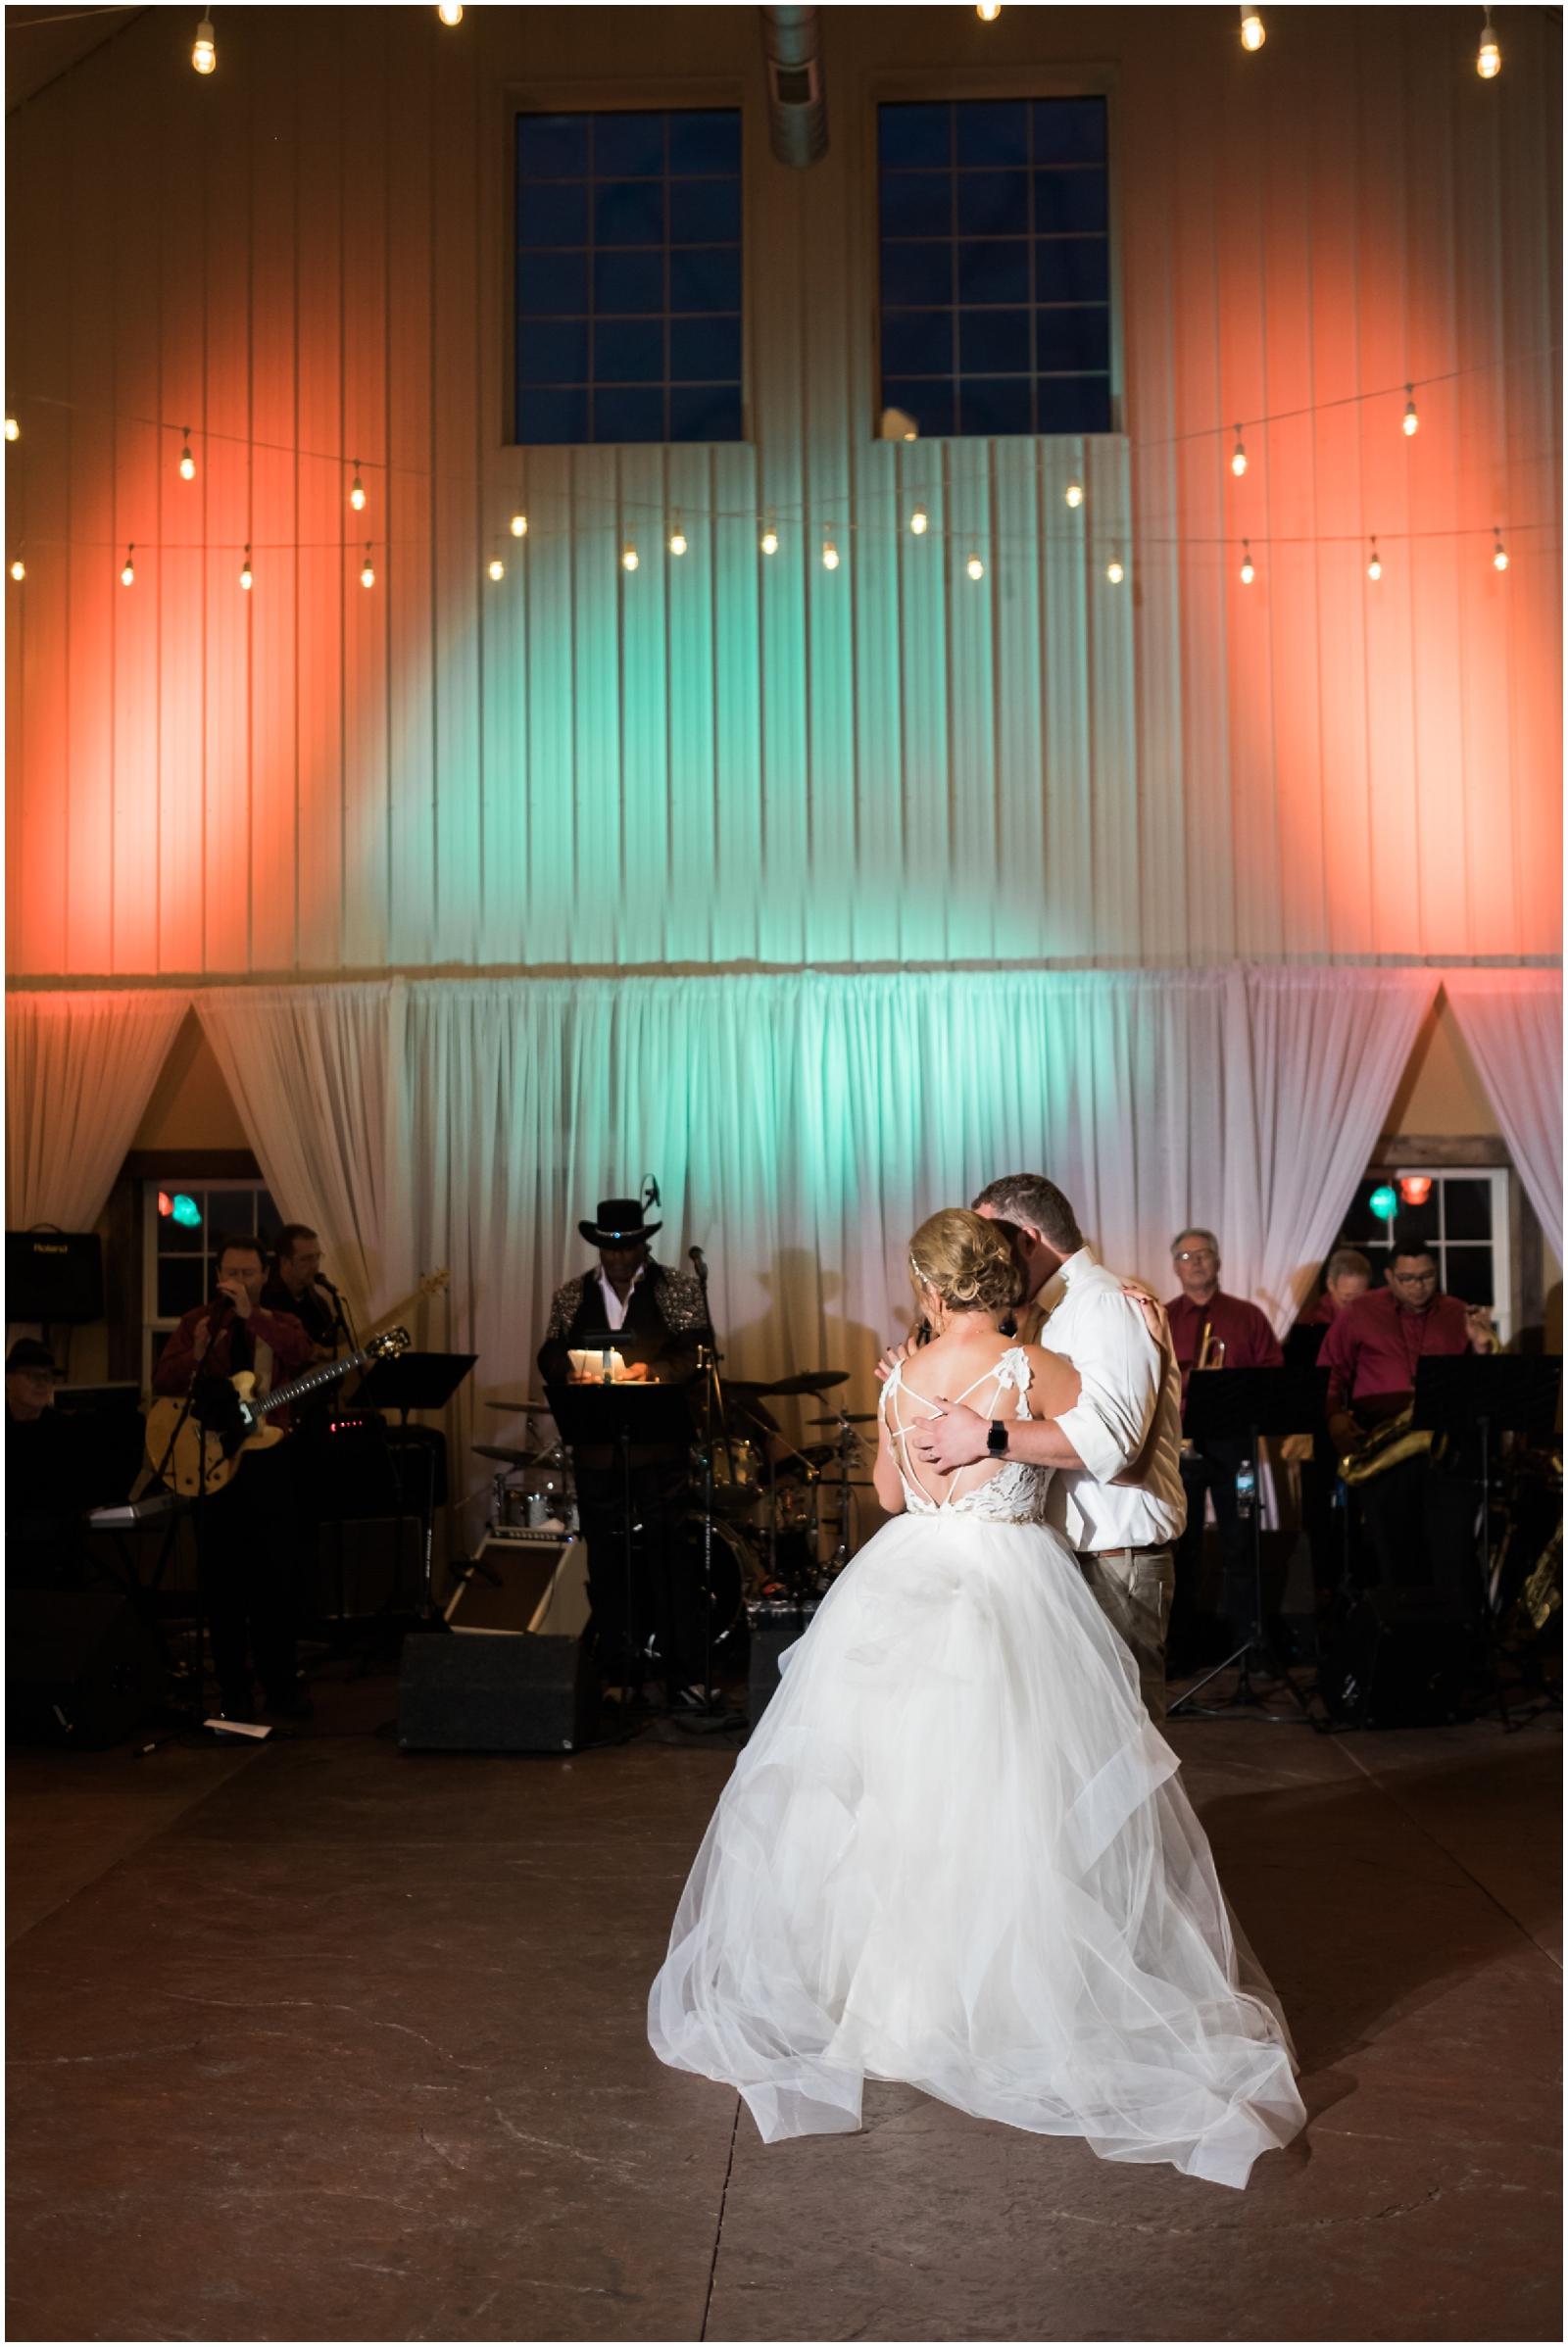 Minnesota-Wedding-Venue- Chaska-MN-Rustic-Barn-Weddings_0607.jpg